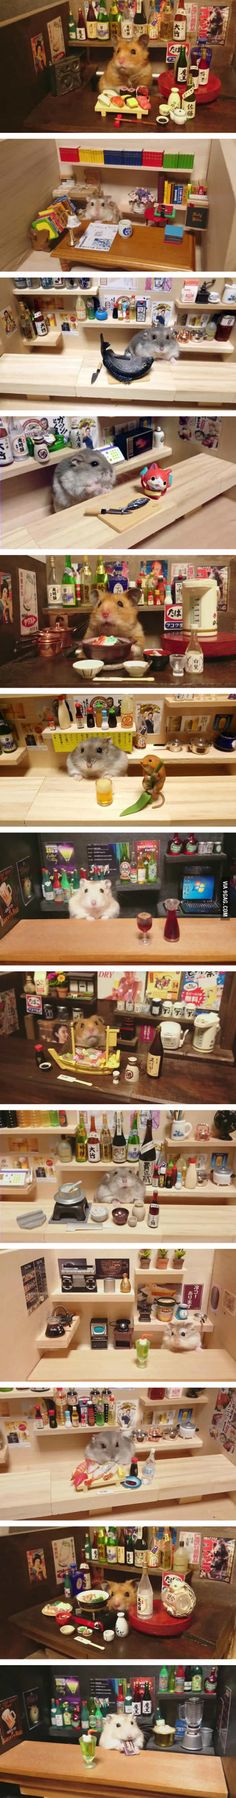 Hamster bartender (by Kawanabesatou)                                                                                                                                                                                 More